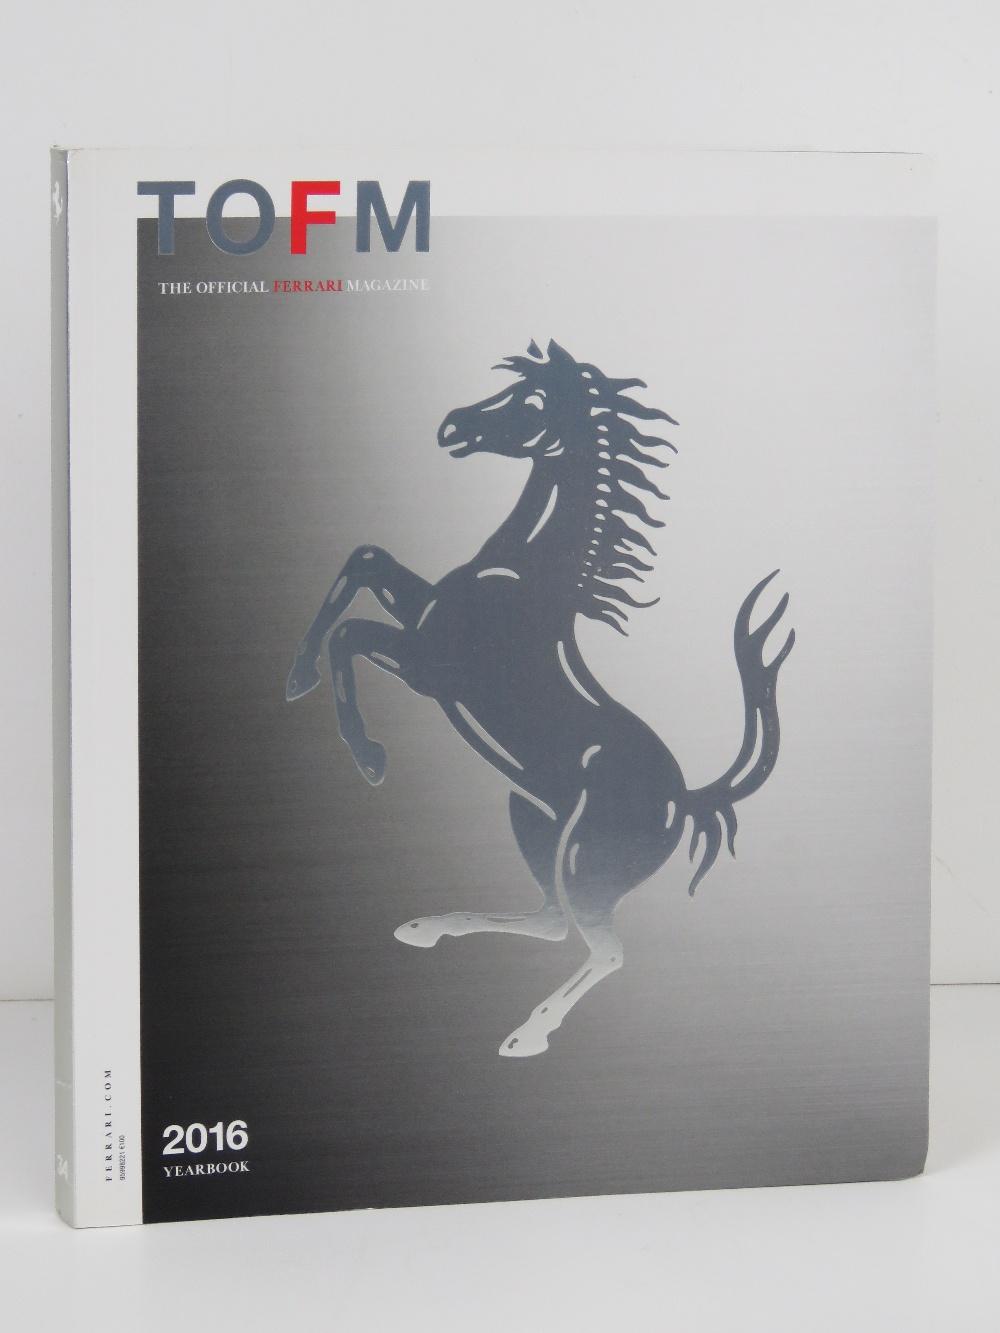 Ferrari Yearbook 2016. English edition. Softback book.